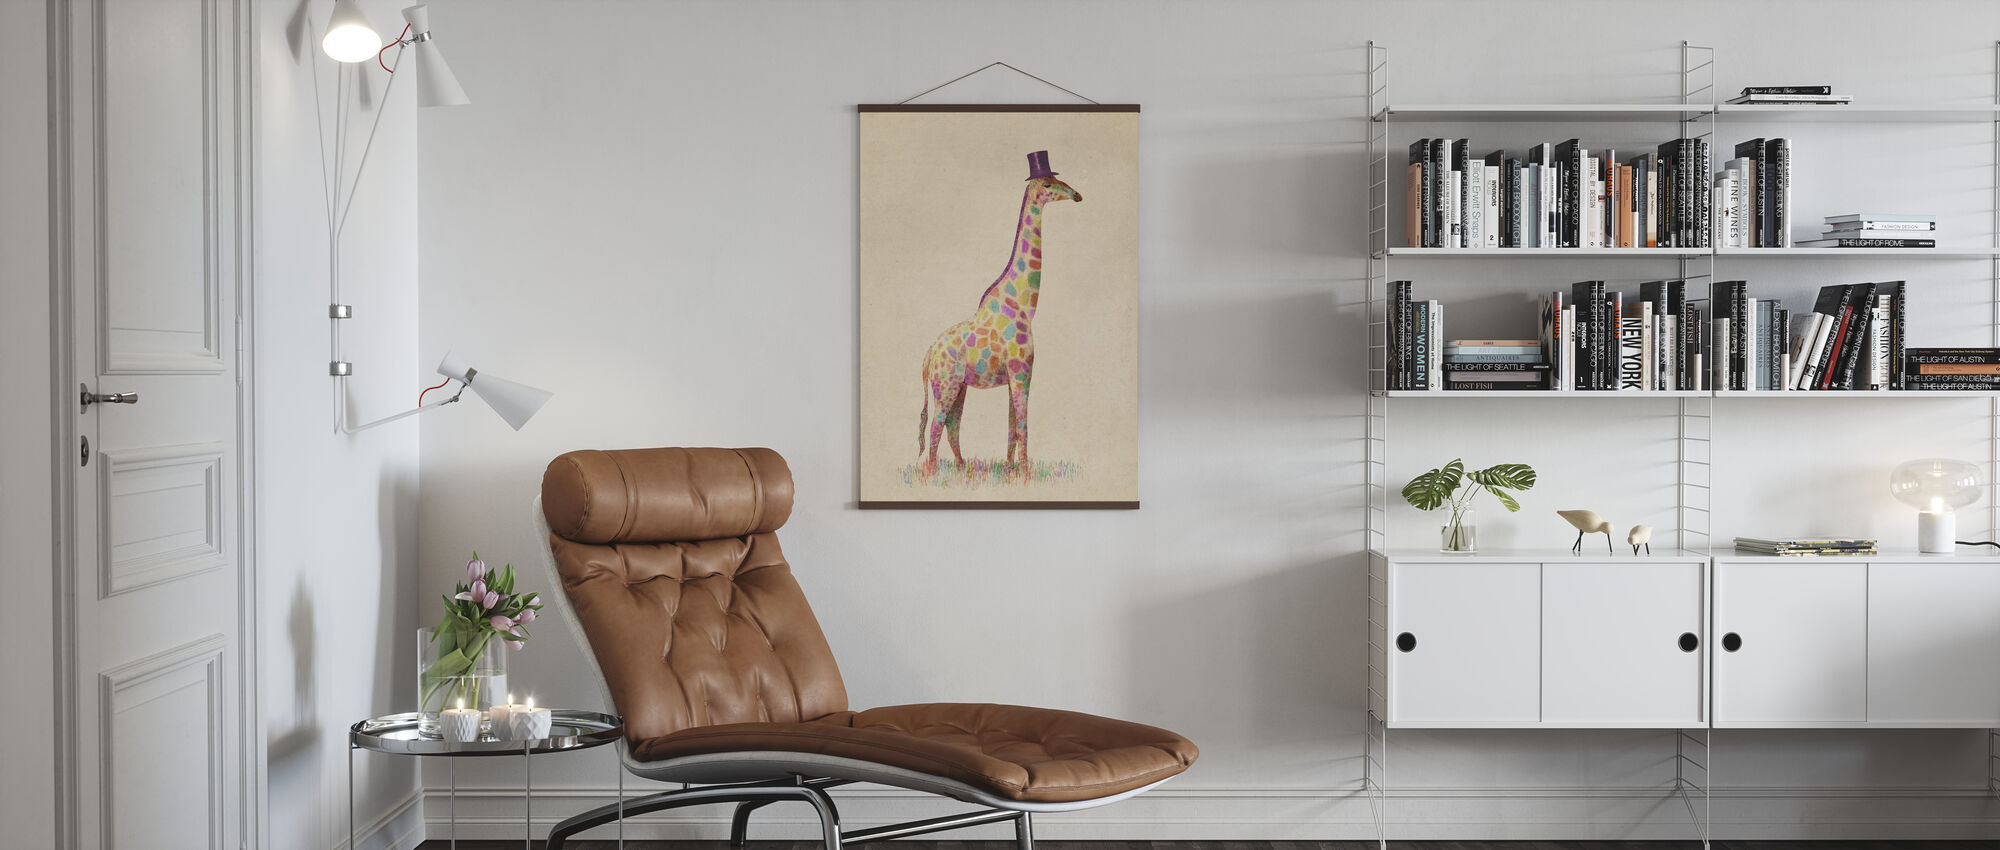 Fashionable Giraffe - Poster - Living Room